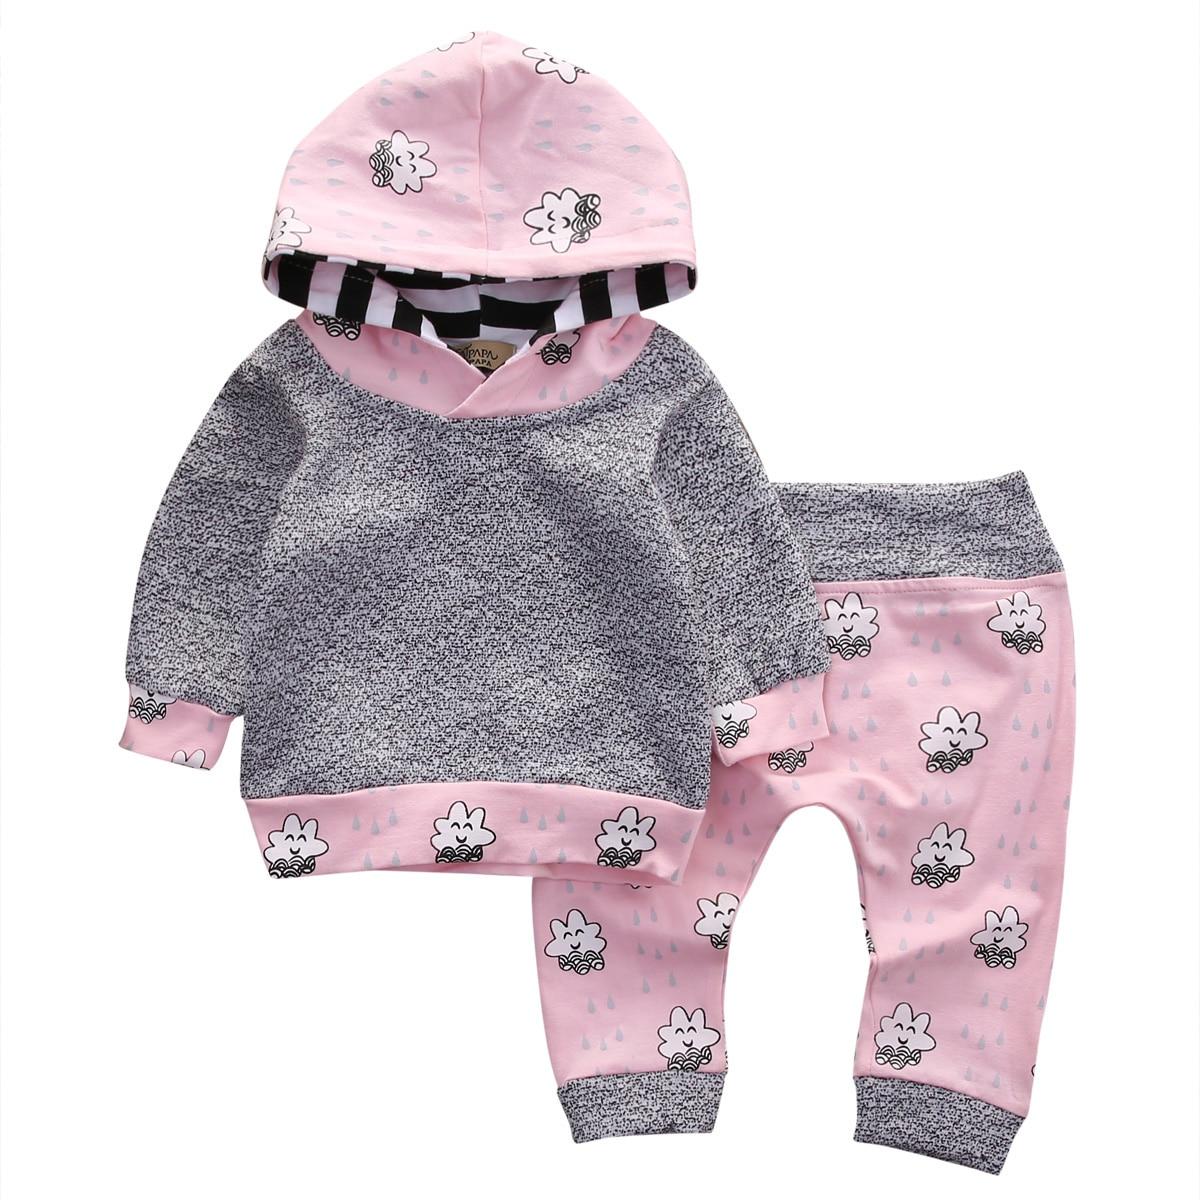 Pink Newborn Baby Girl Clothes Cute Smile Cloud Bebes Hooded Top Pant 2pcs Autumn Winter Suit Bebek Giyim Clothing Set